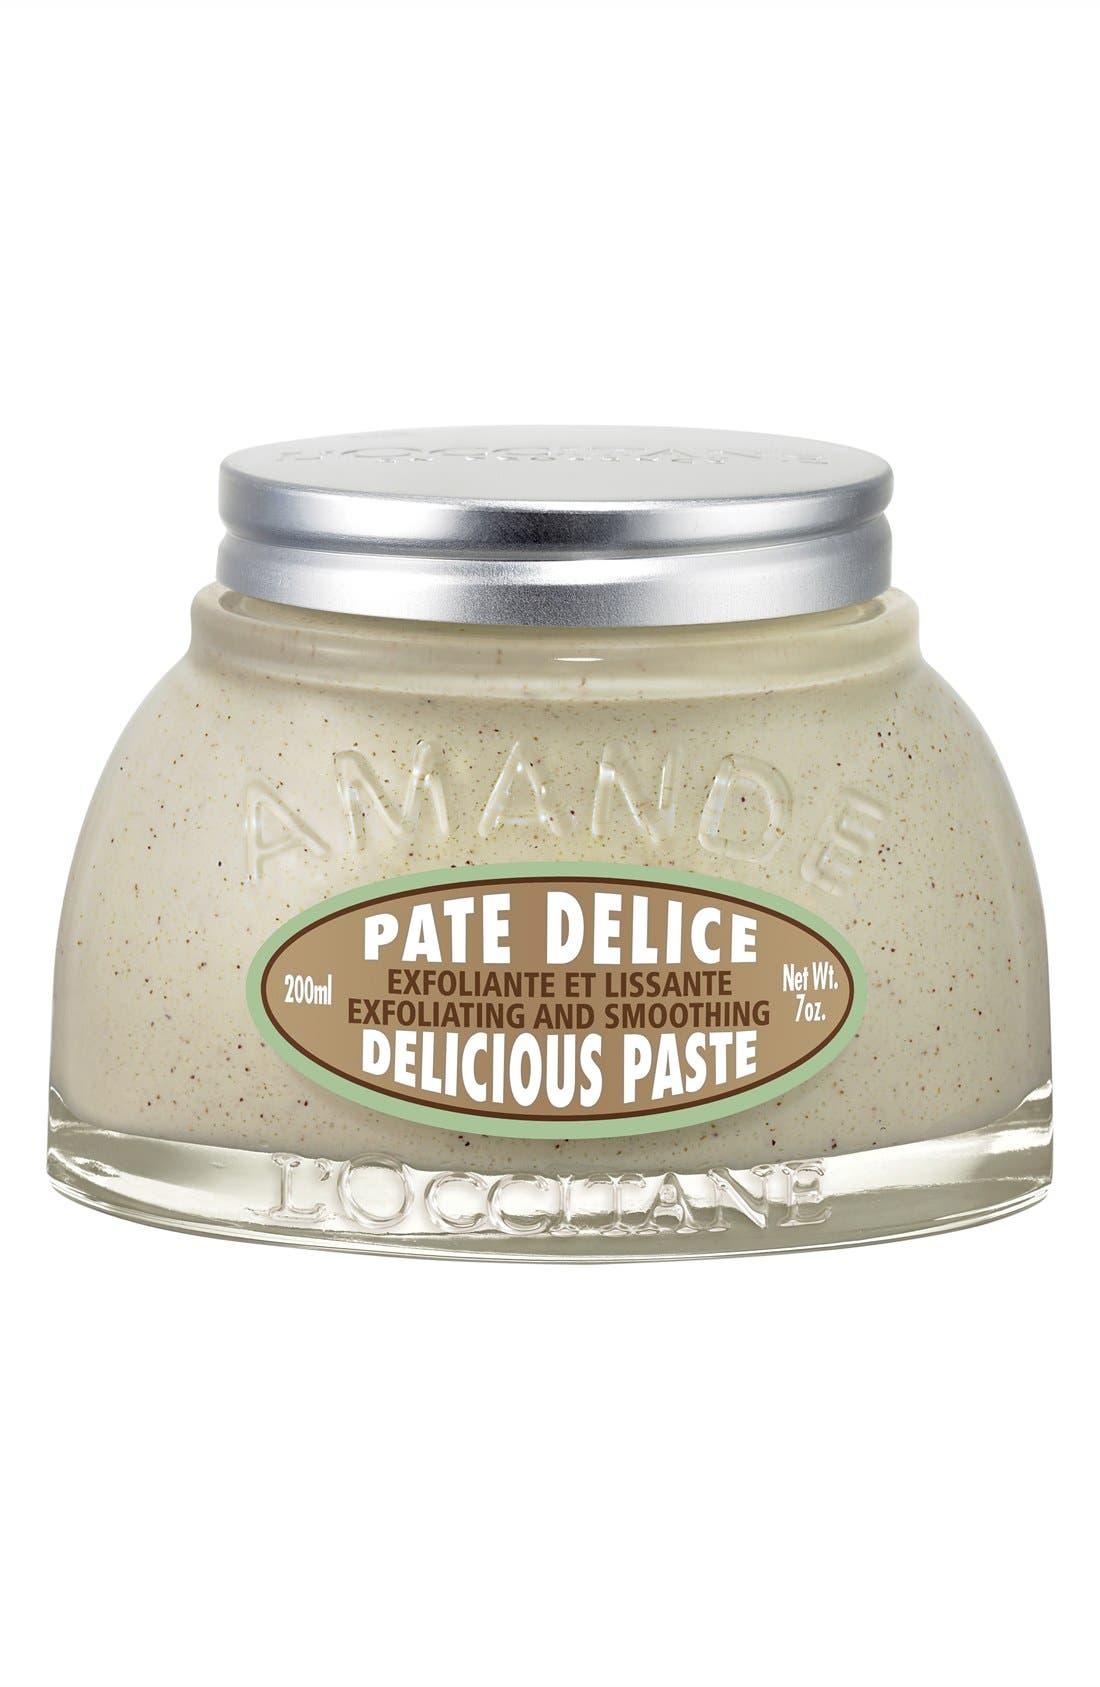 'Almond Delicious Paste' Exfoliating Butter,                             Main thumbnail 1, color,                             000